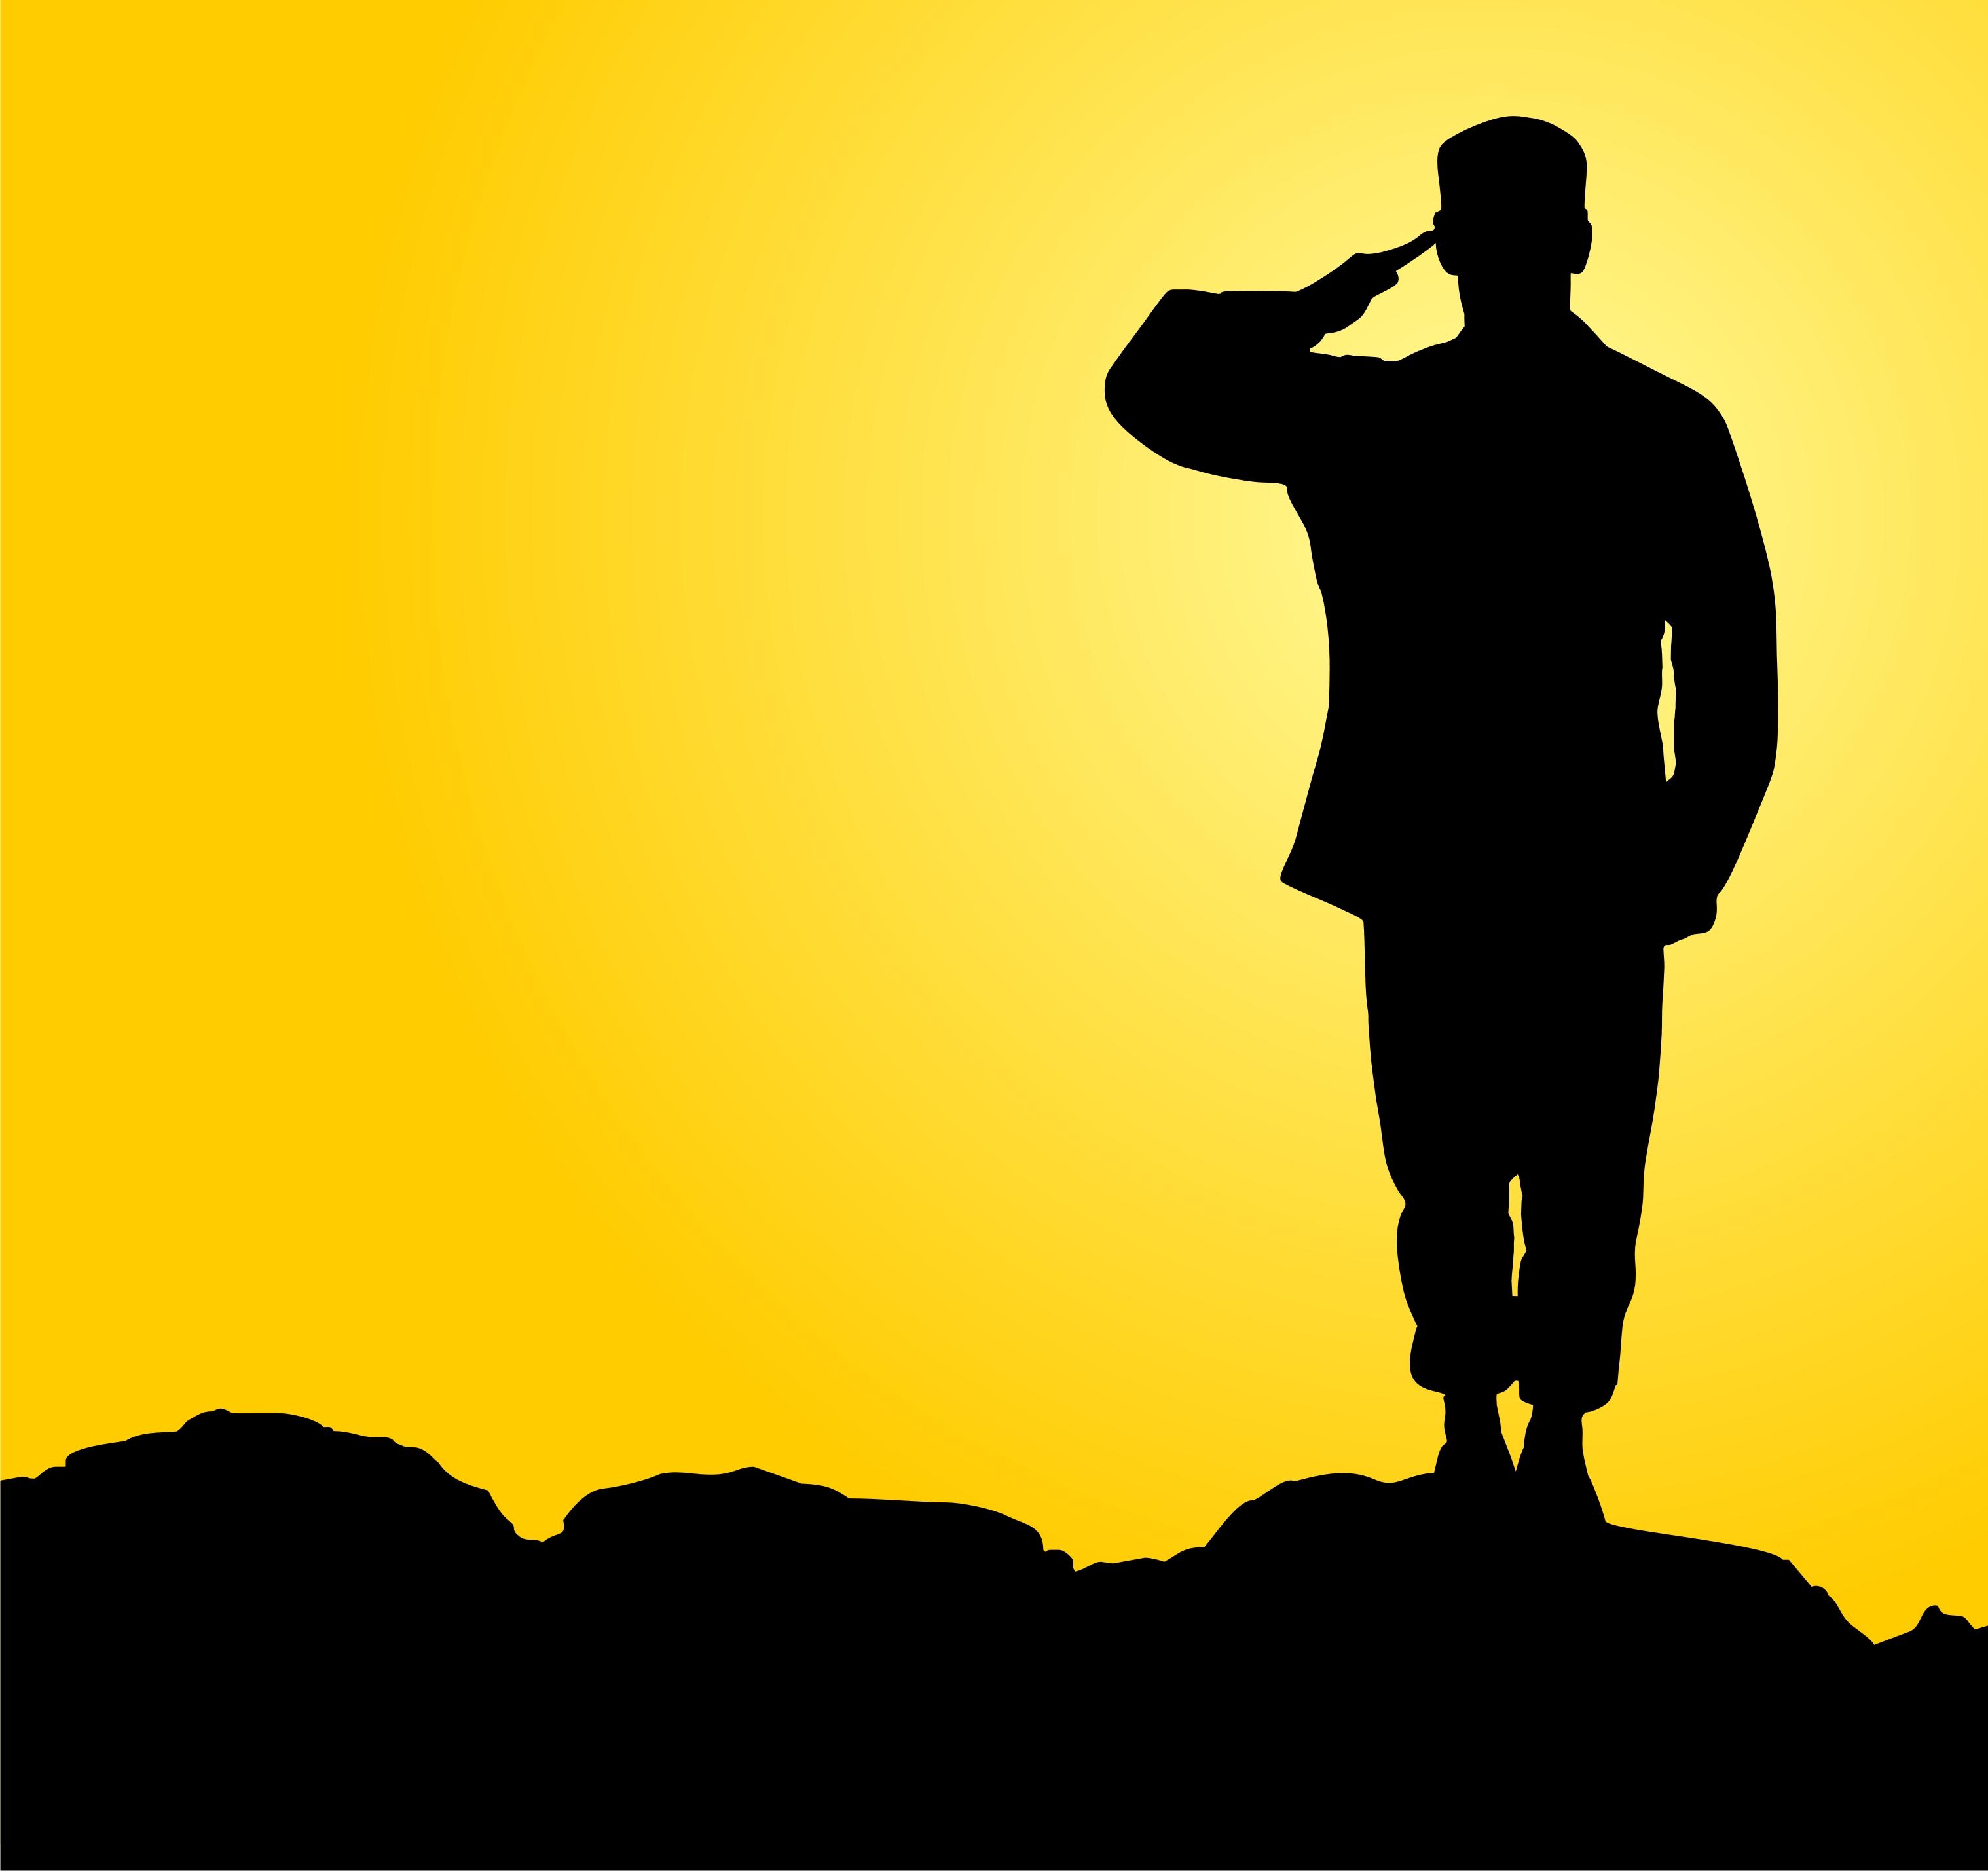 Veteran Silhouette